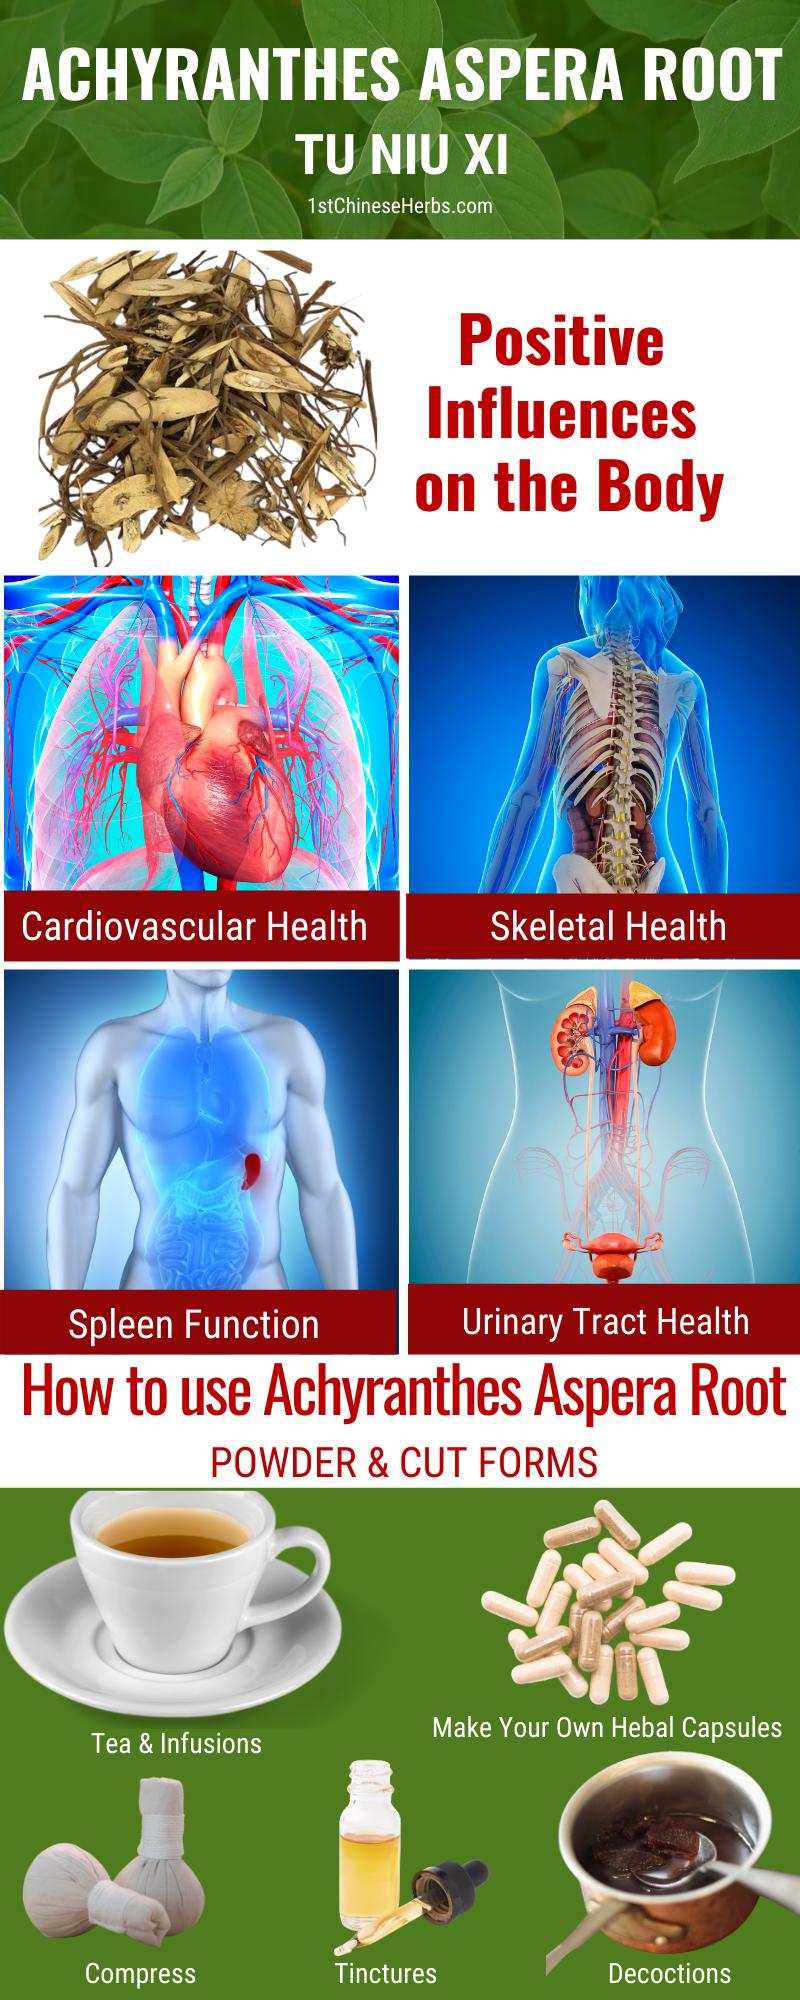 Achyranthes aspera root benefits, tu niu xi benefits, achyranathes aspera root uses, tu niu xi uses